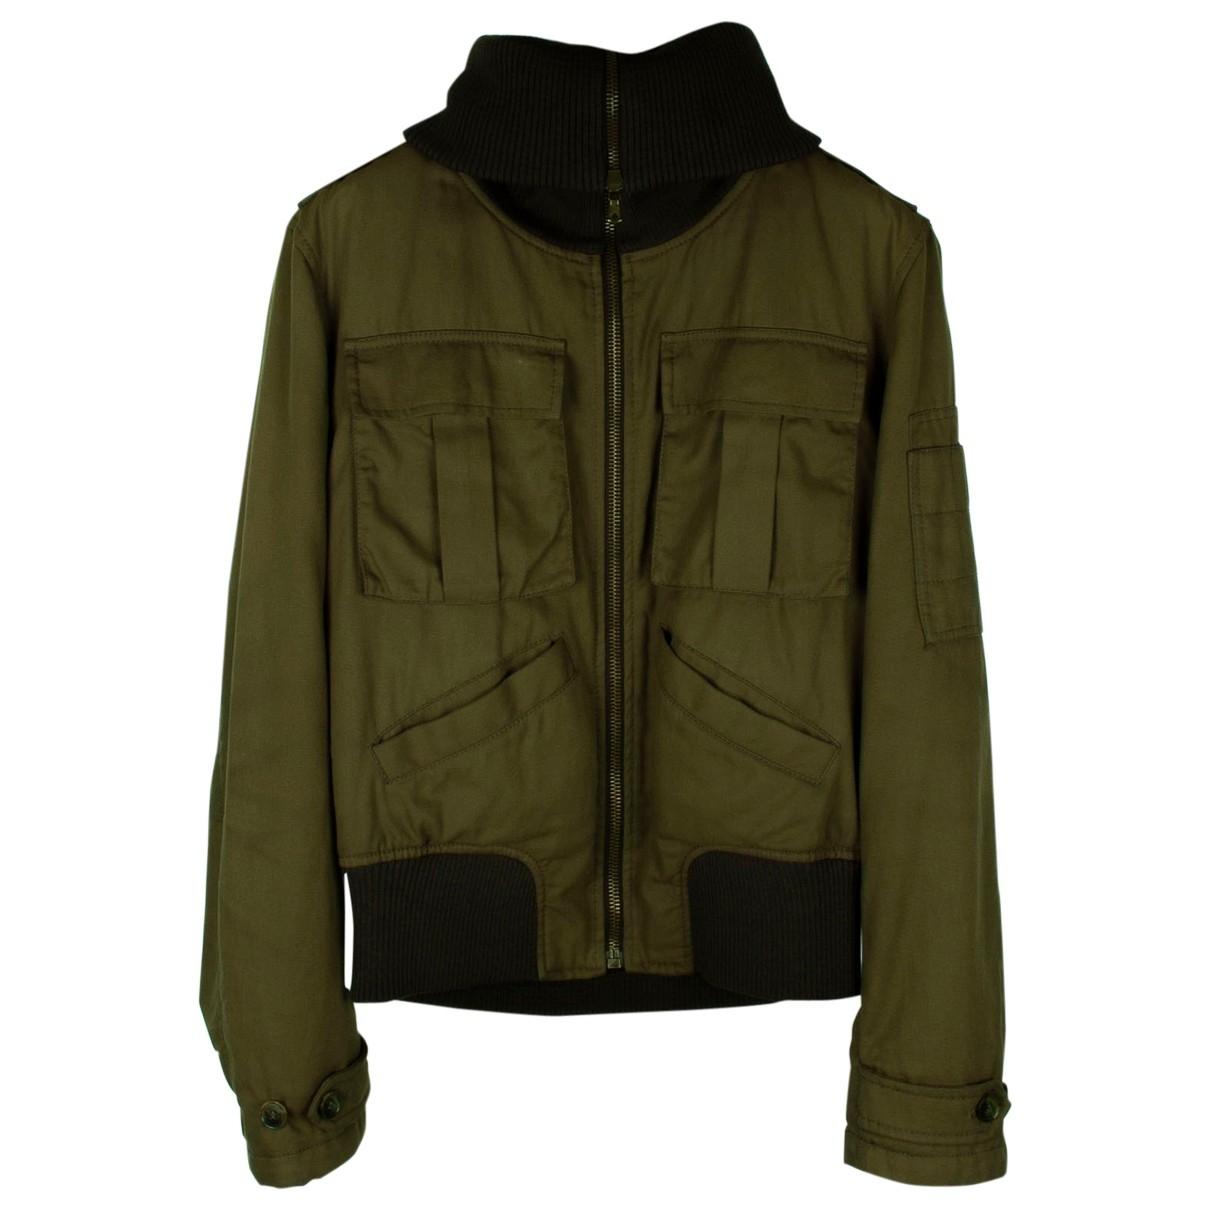 Dolce & Gabbana \N Khaki Cotton jacket  for Men M International